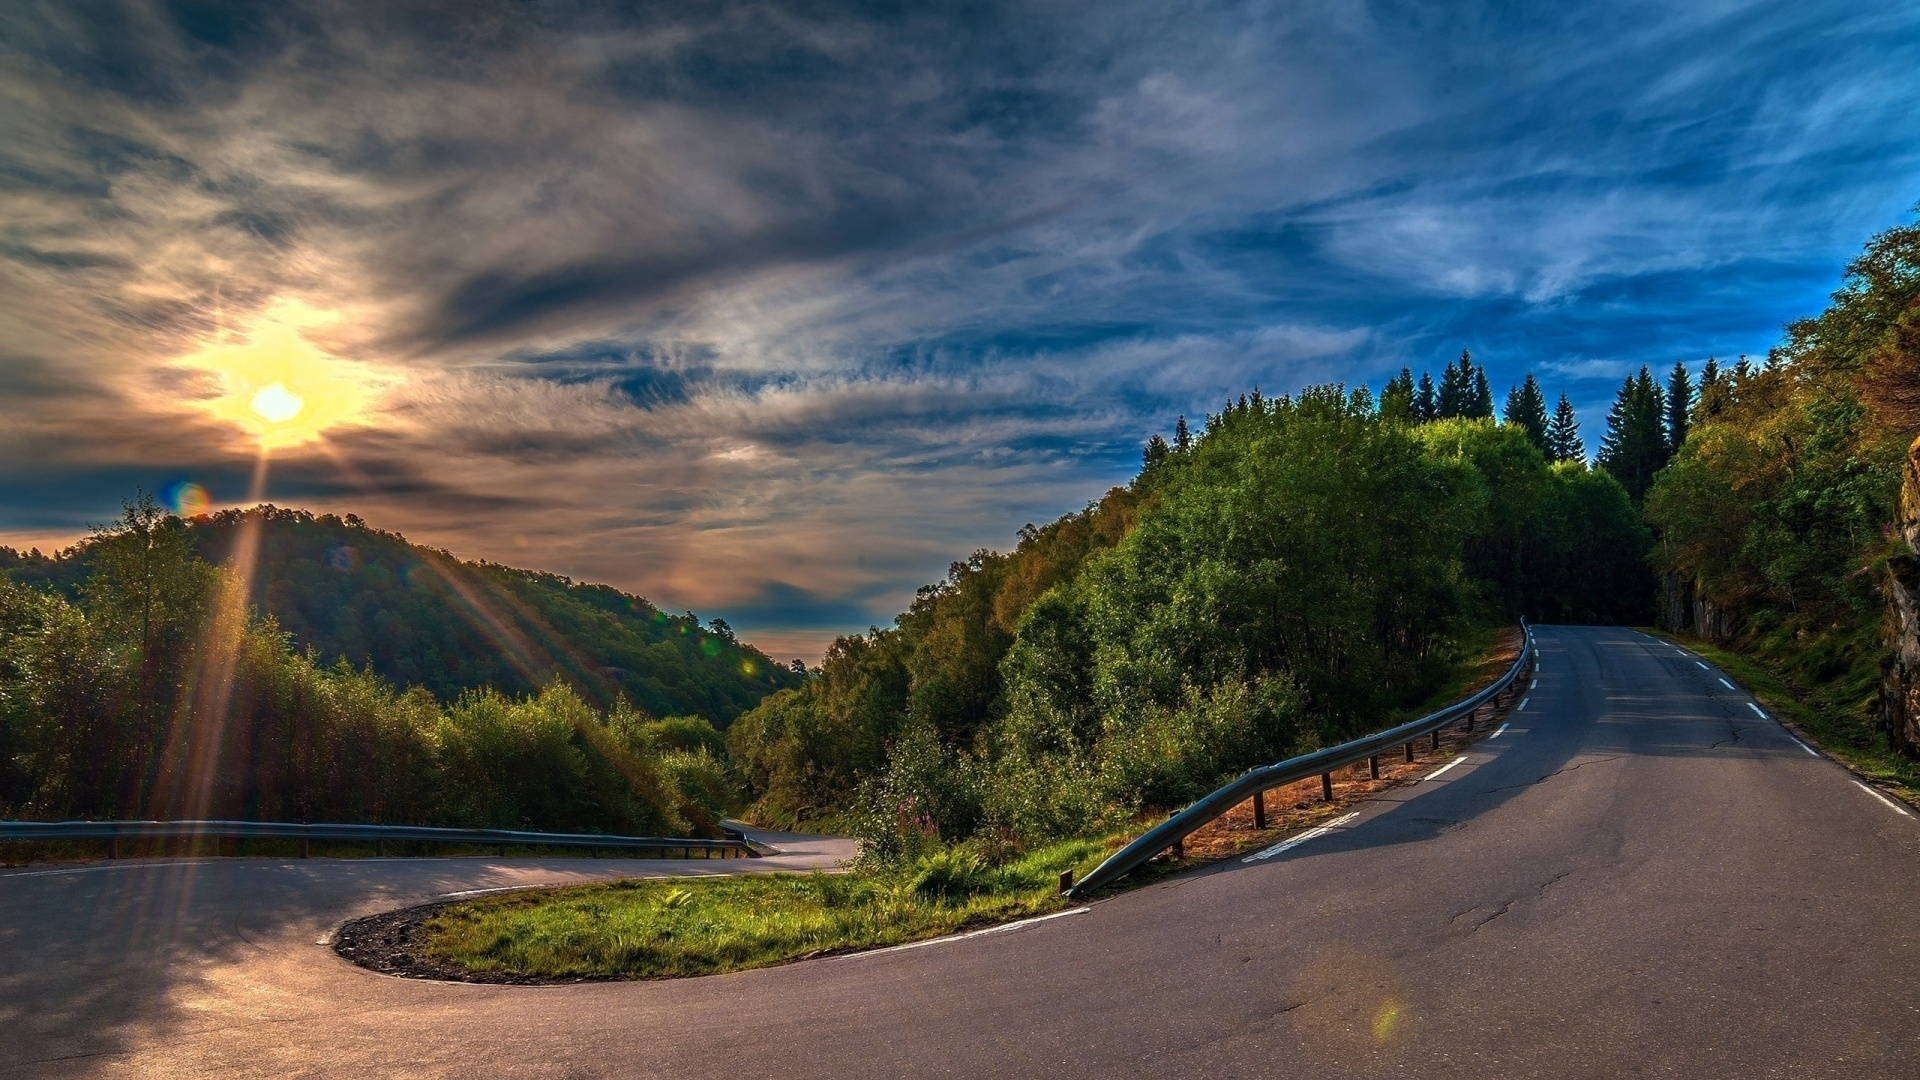 Download Wallpaper 1920x1080 Sunset Serpentine Road Full HD 1080p